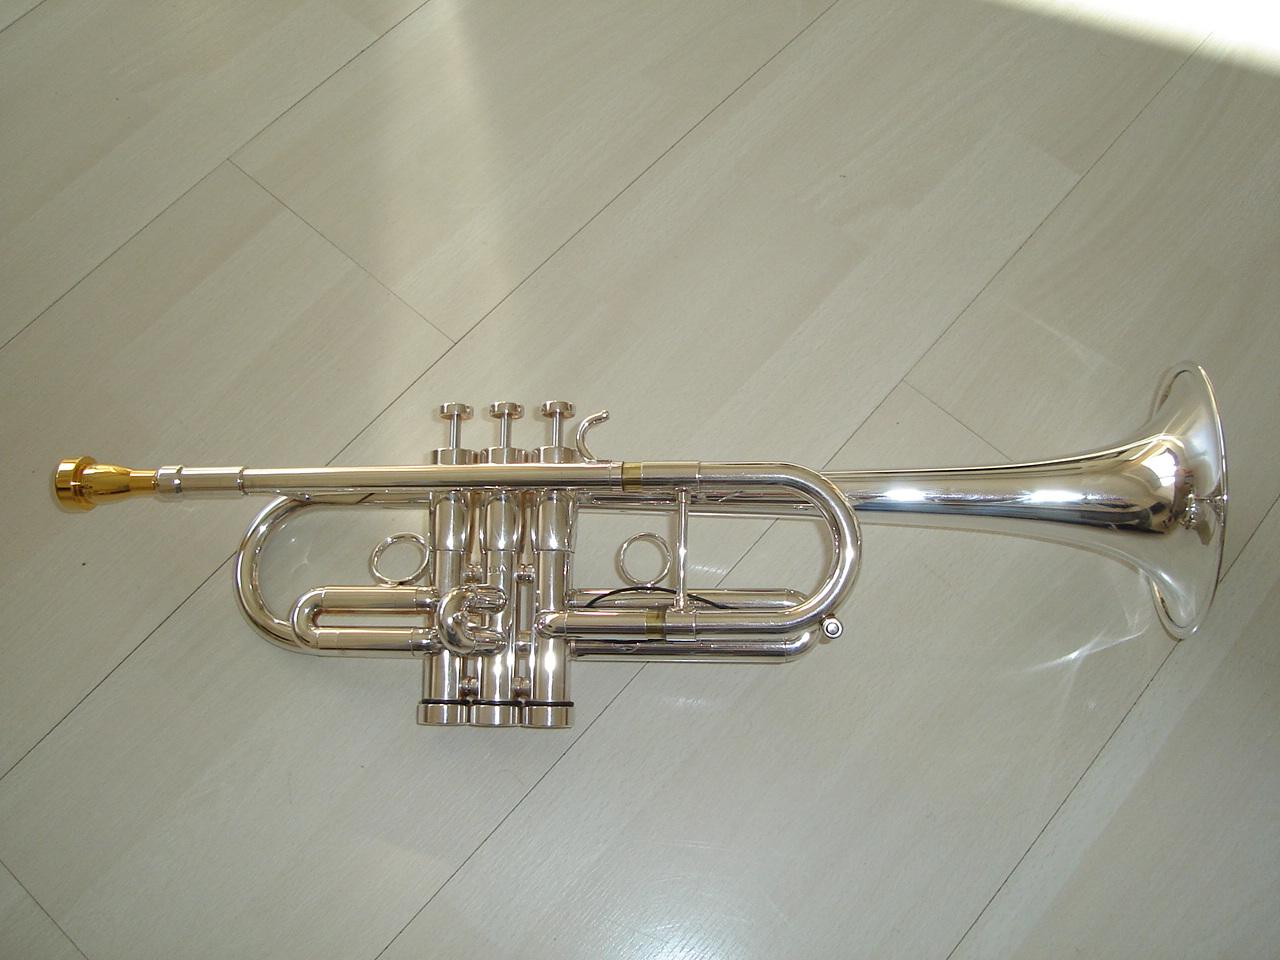 Trumpet For Sale : monette trumpet for sale buy my used monette stc c trumpet ~ Vivirlamusica.com Haus und Dekorationen